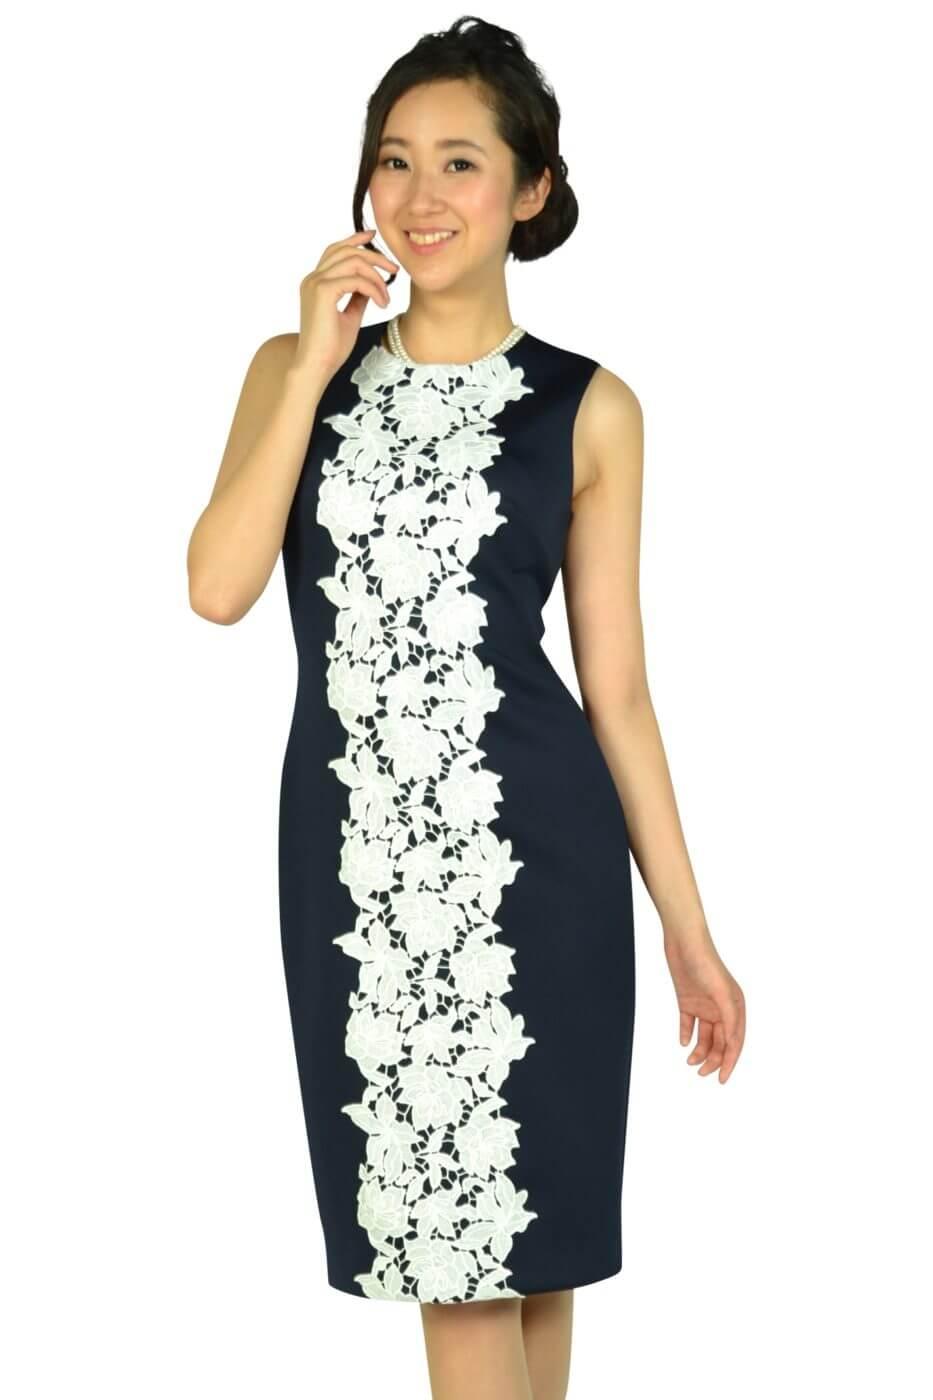 fbc320de52fe4 カルバンクライン (Calvin Klein)センターレースネイビードレス